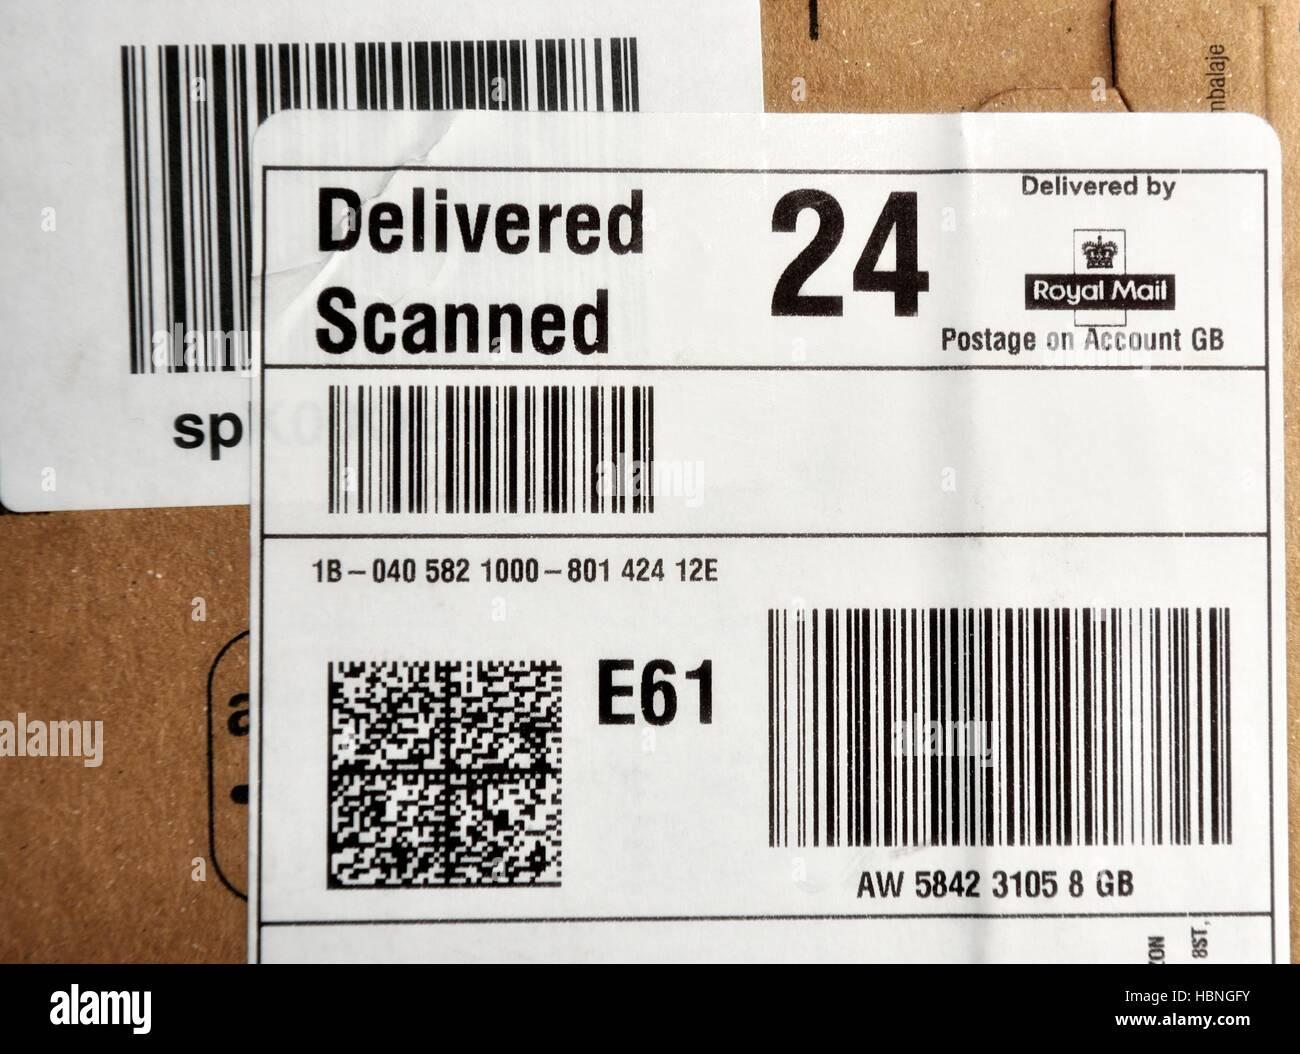 Scanned Fotos e Imágenes de stock Alamy